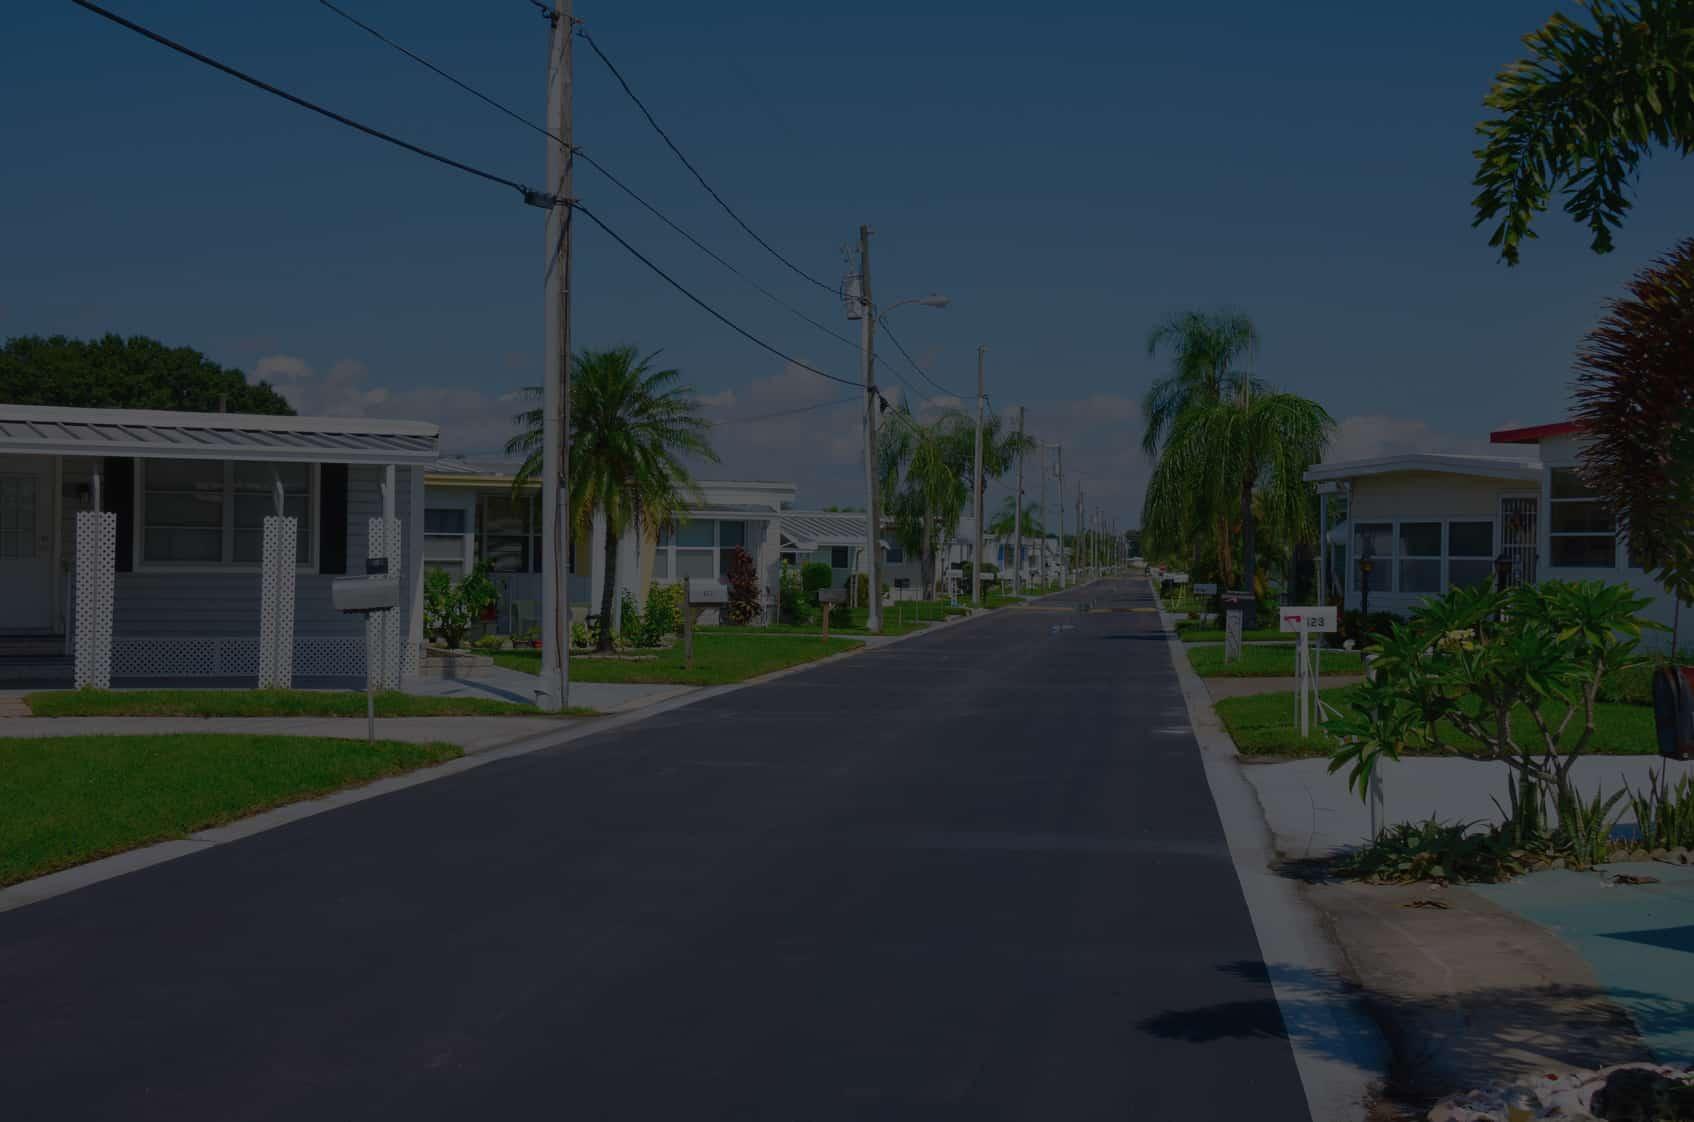 Florida Mobile Home Park Street View - Title Management Services